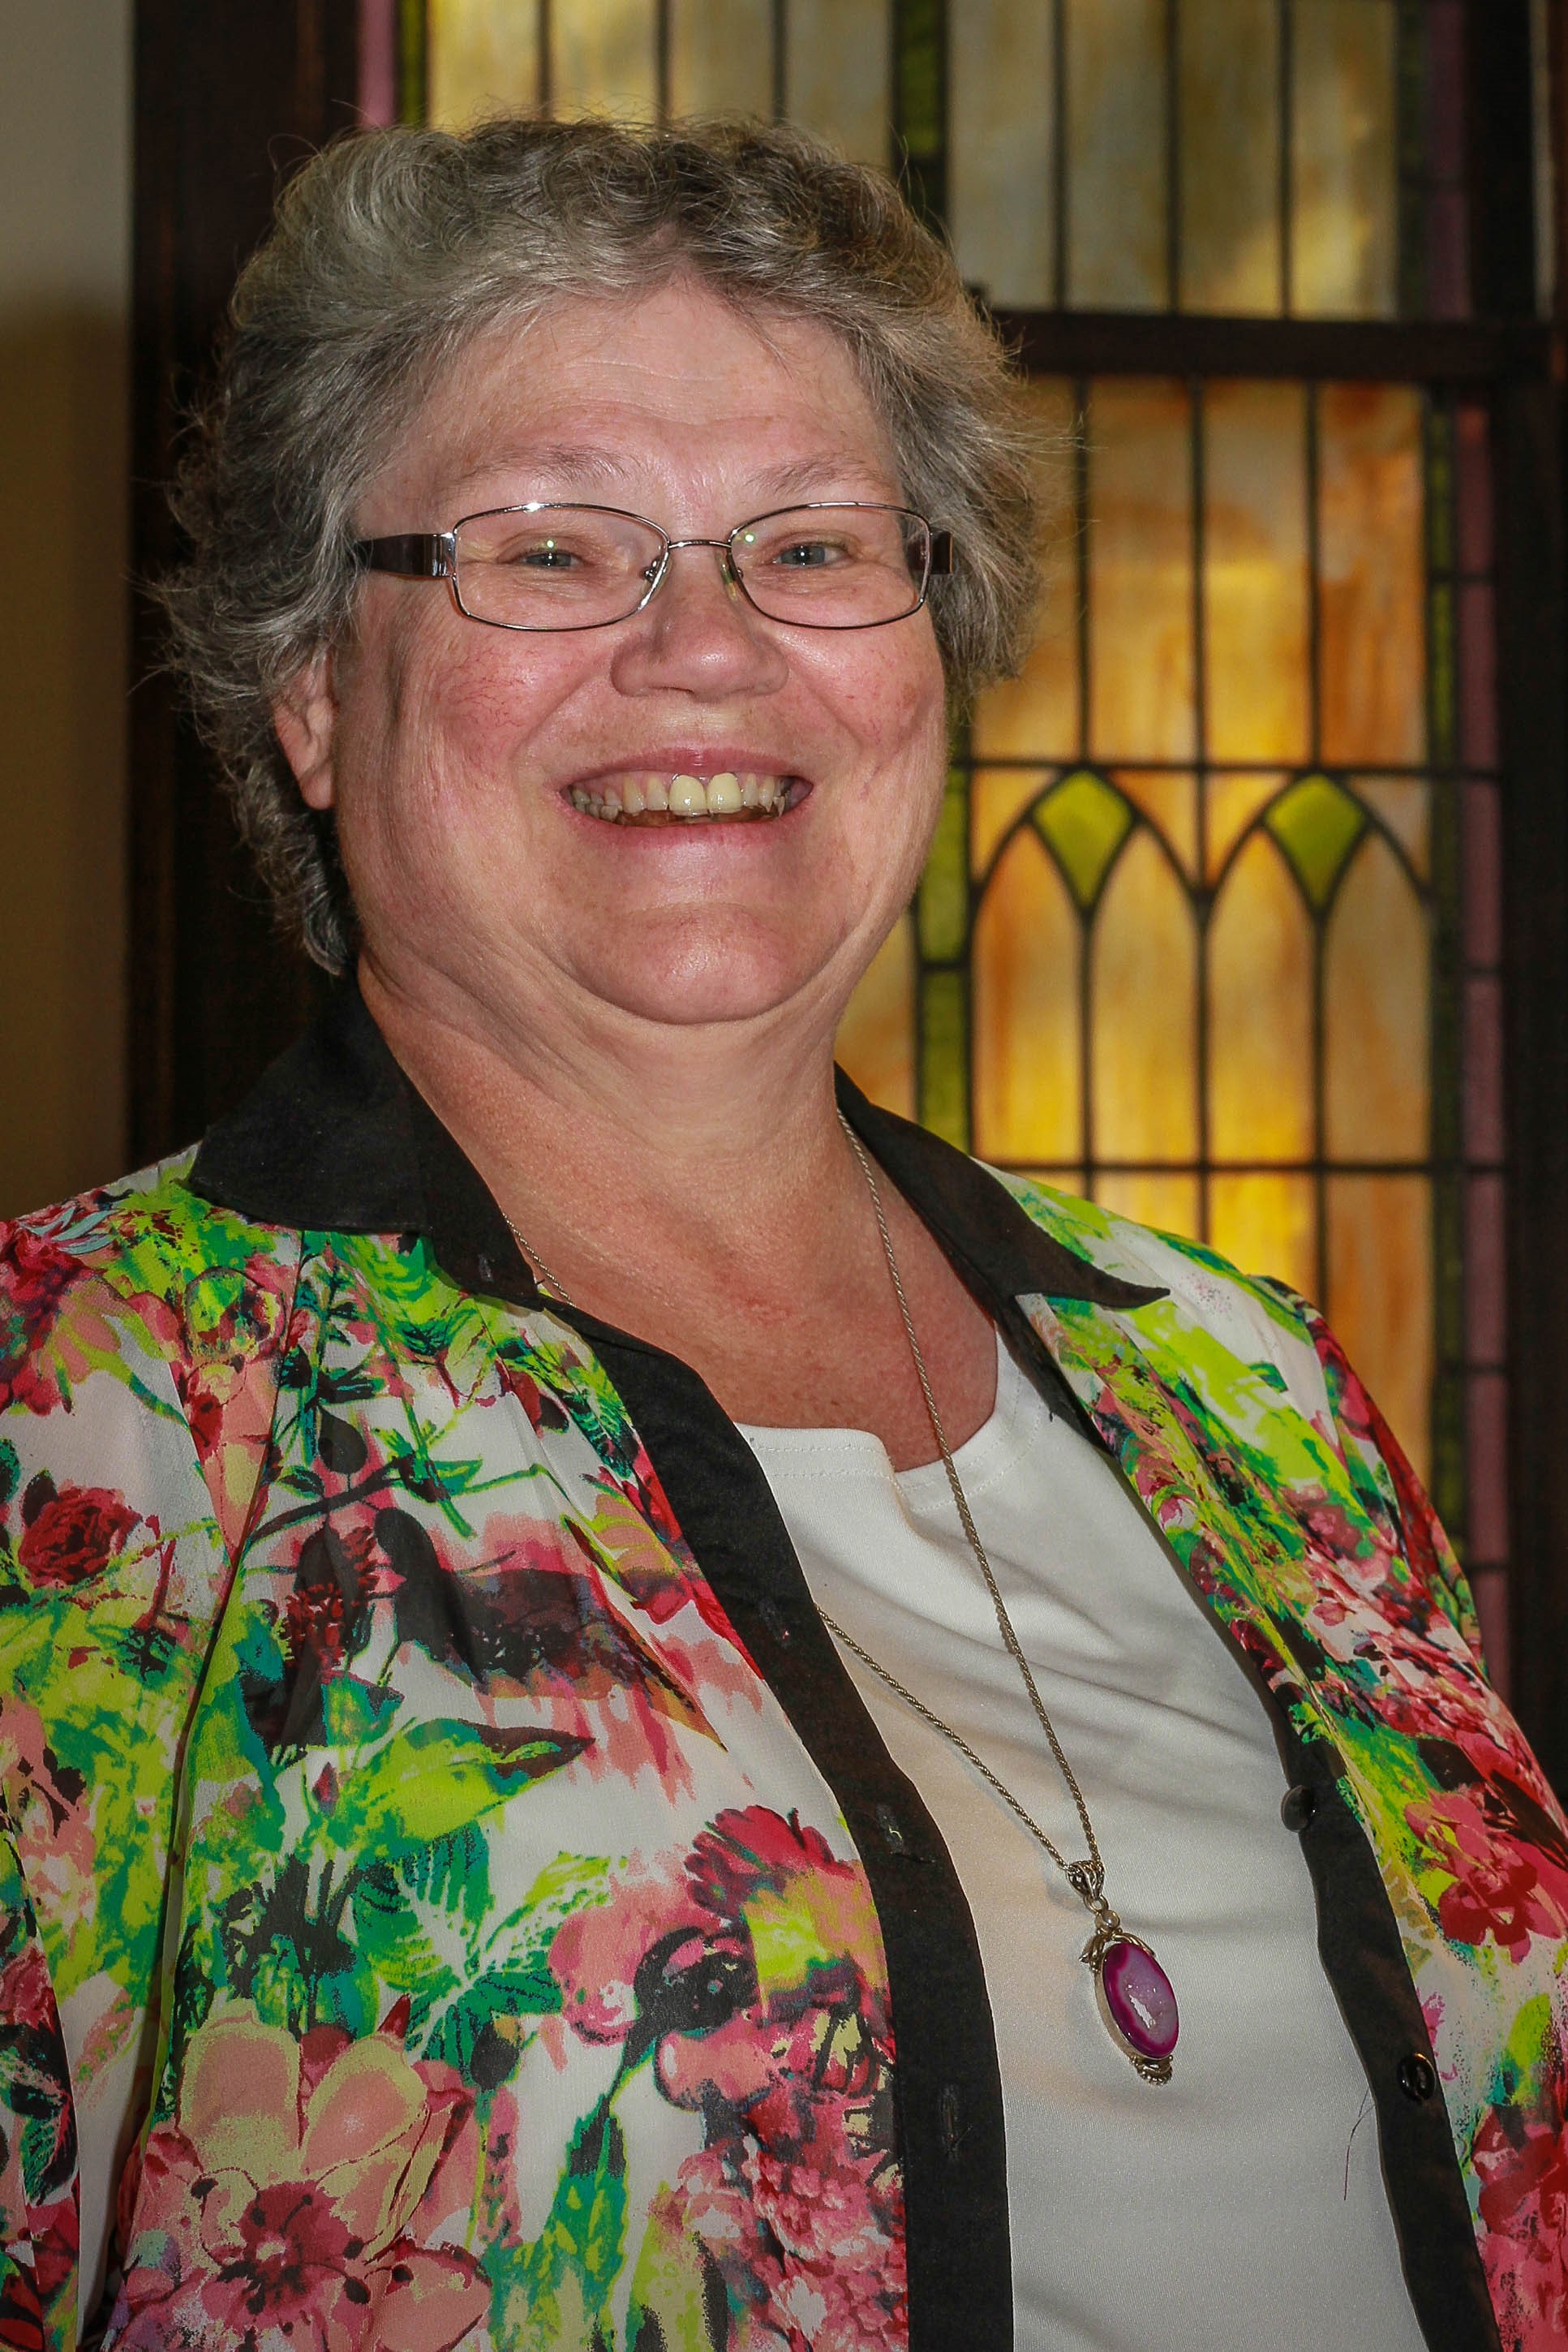 Reverend Debbie Powell